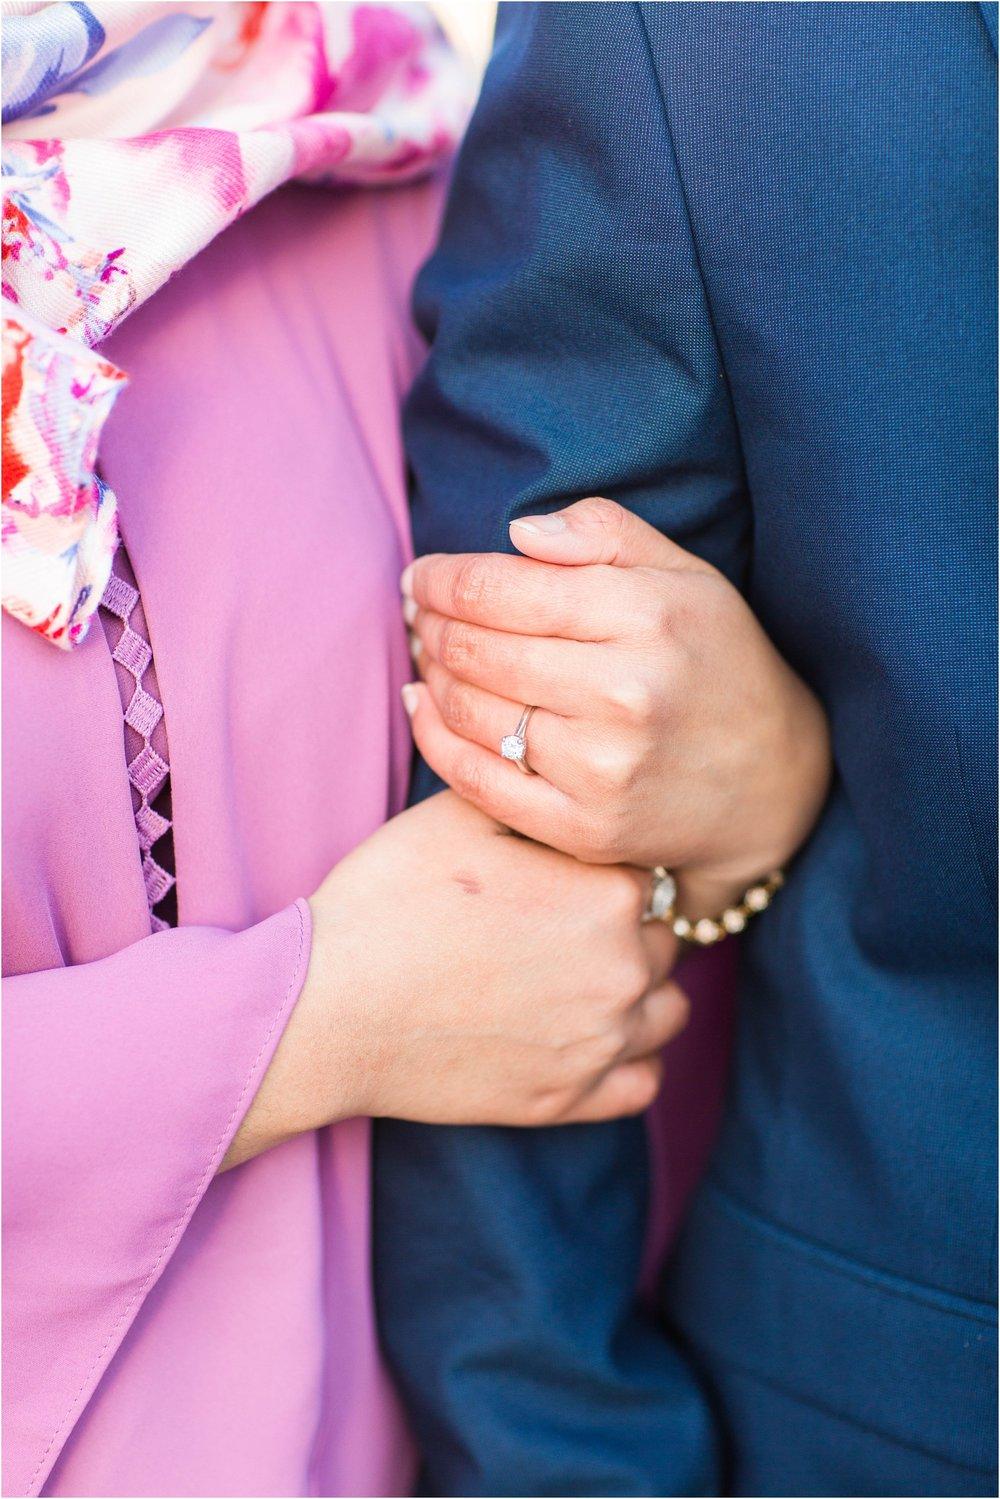 Shops-at-Don-Mills-Engagement-Session-Toronto-Mississauga-Brampton-Scarborough-GTA-Pakistani-Indian-Wedding-Engagement-Photographer-Photography_0027.jpg